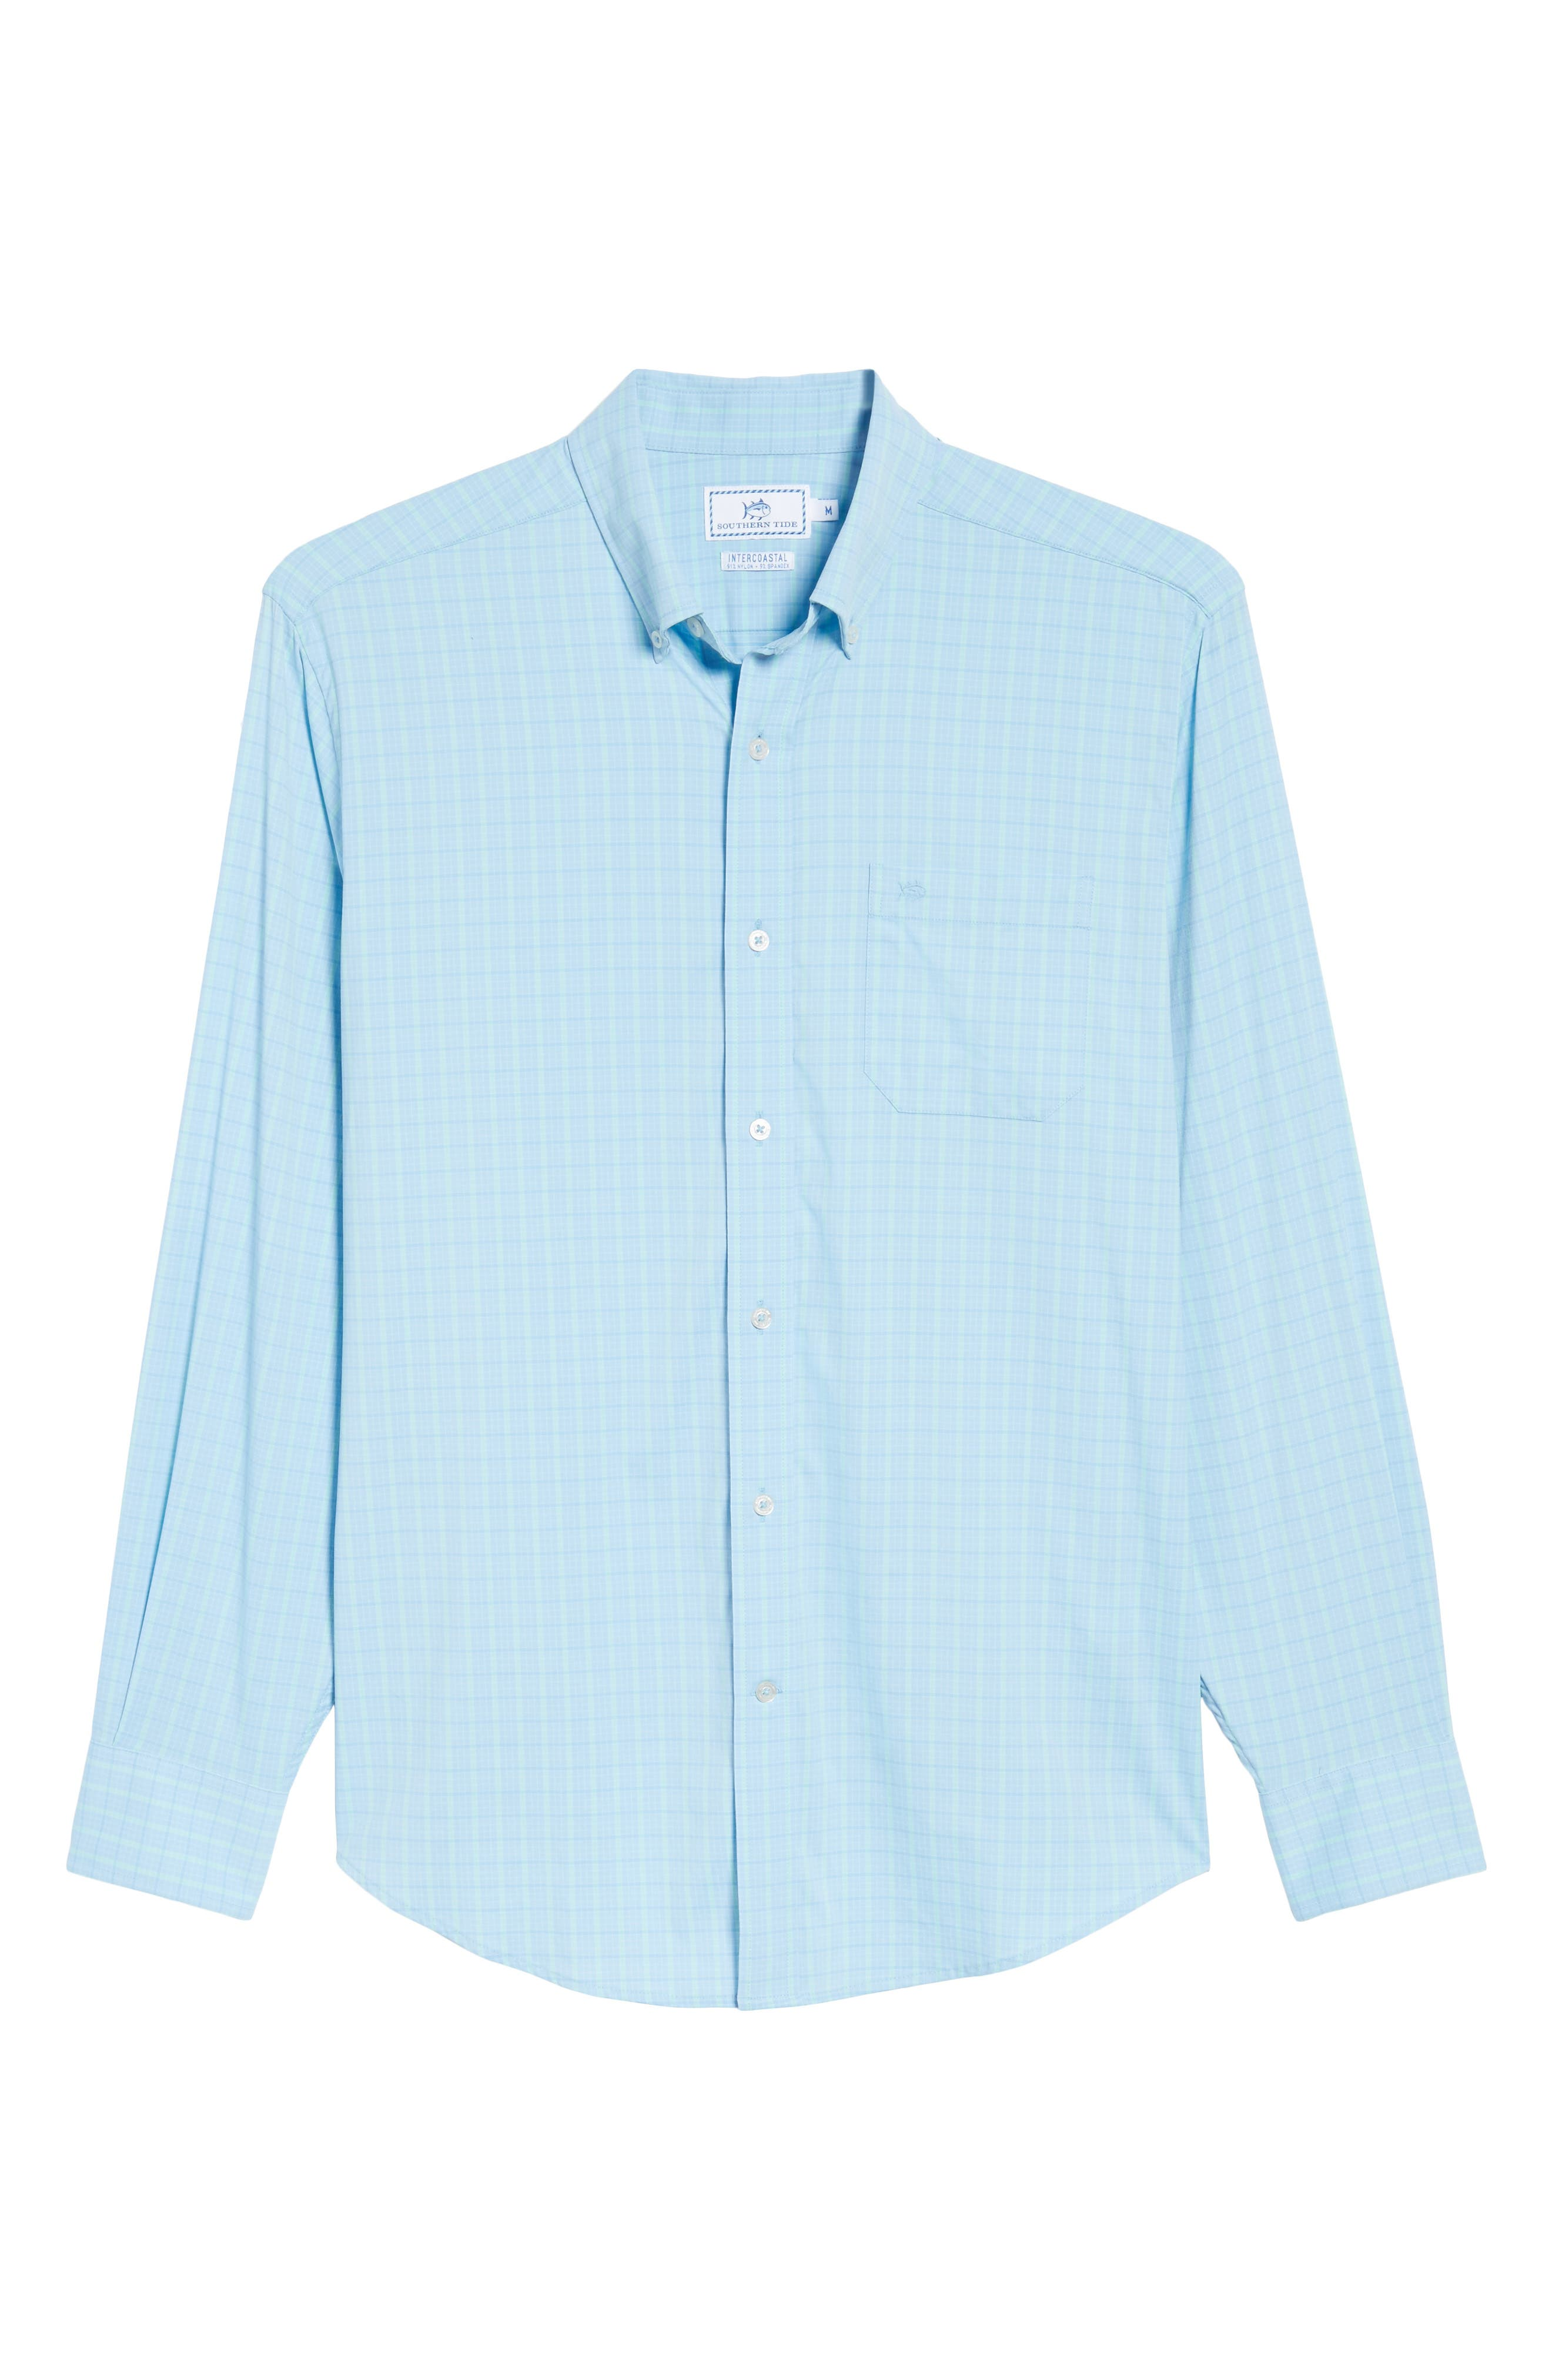 Intercoastal Gordia Plaid Sport Shirt,                             Alternate thumbnail 12, color,